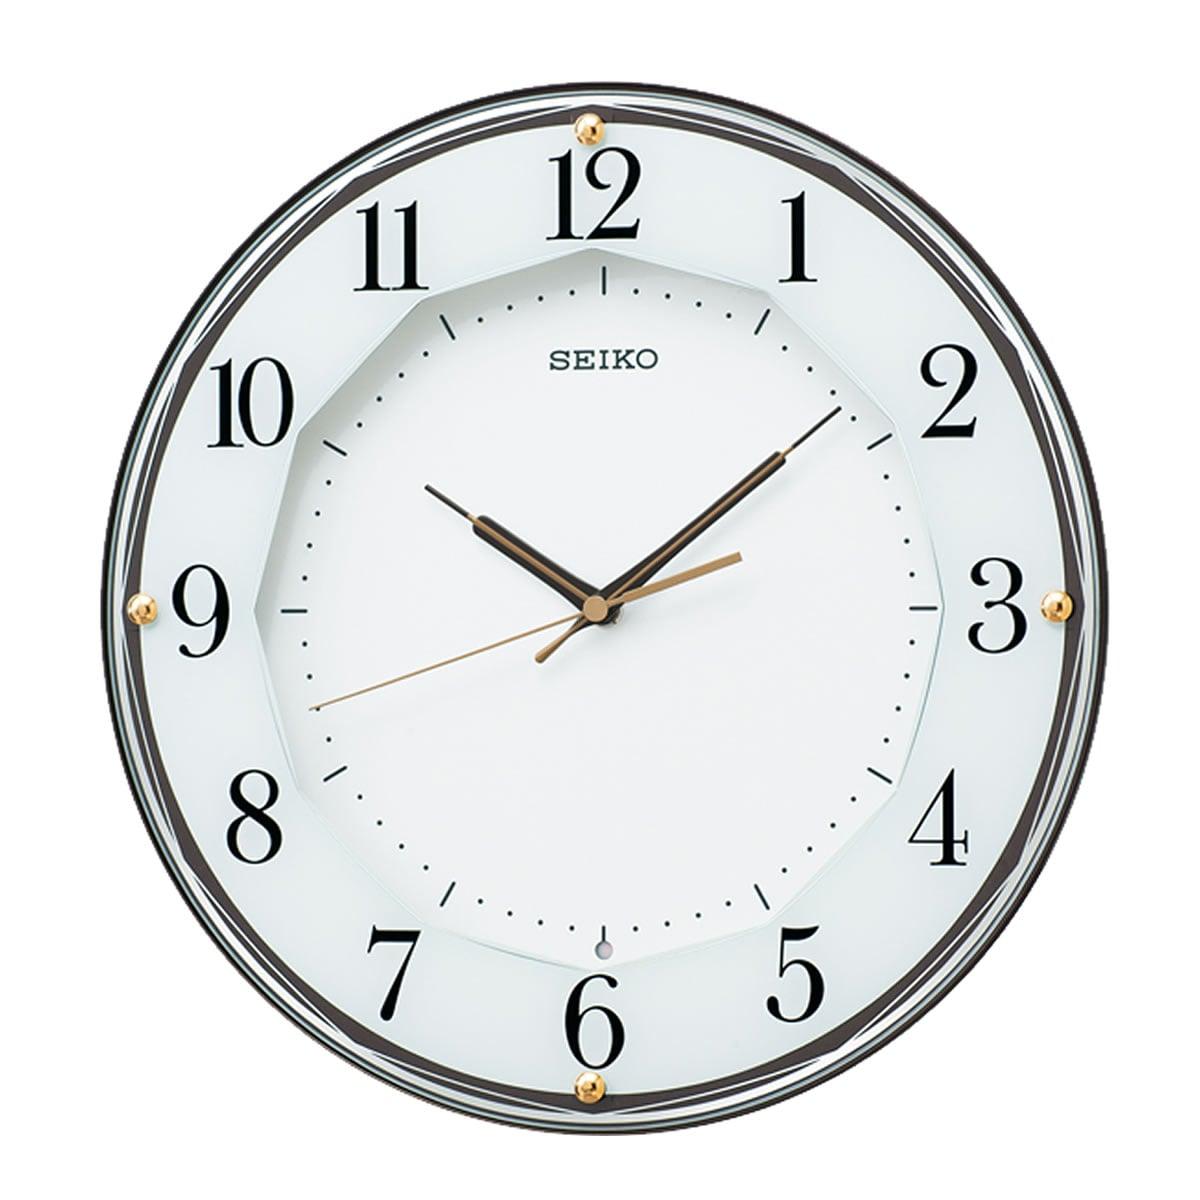 SEIKO(セイコー)スタンダード 電波掛け時計 KX213B